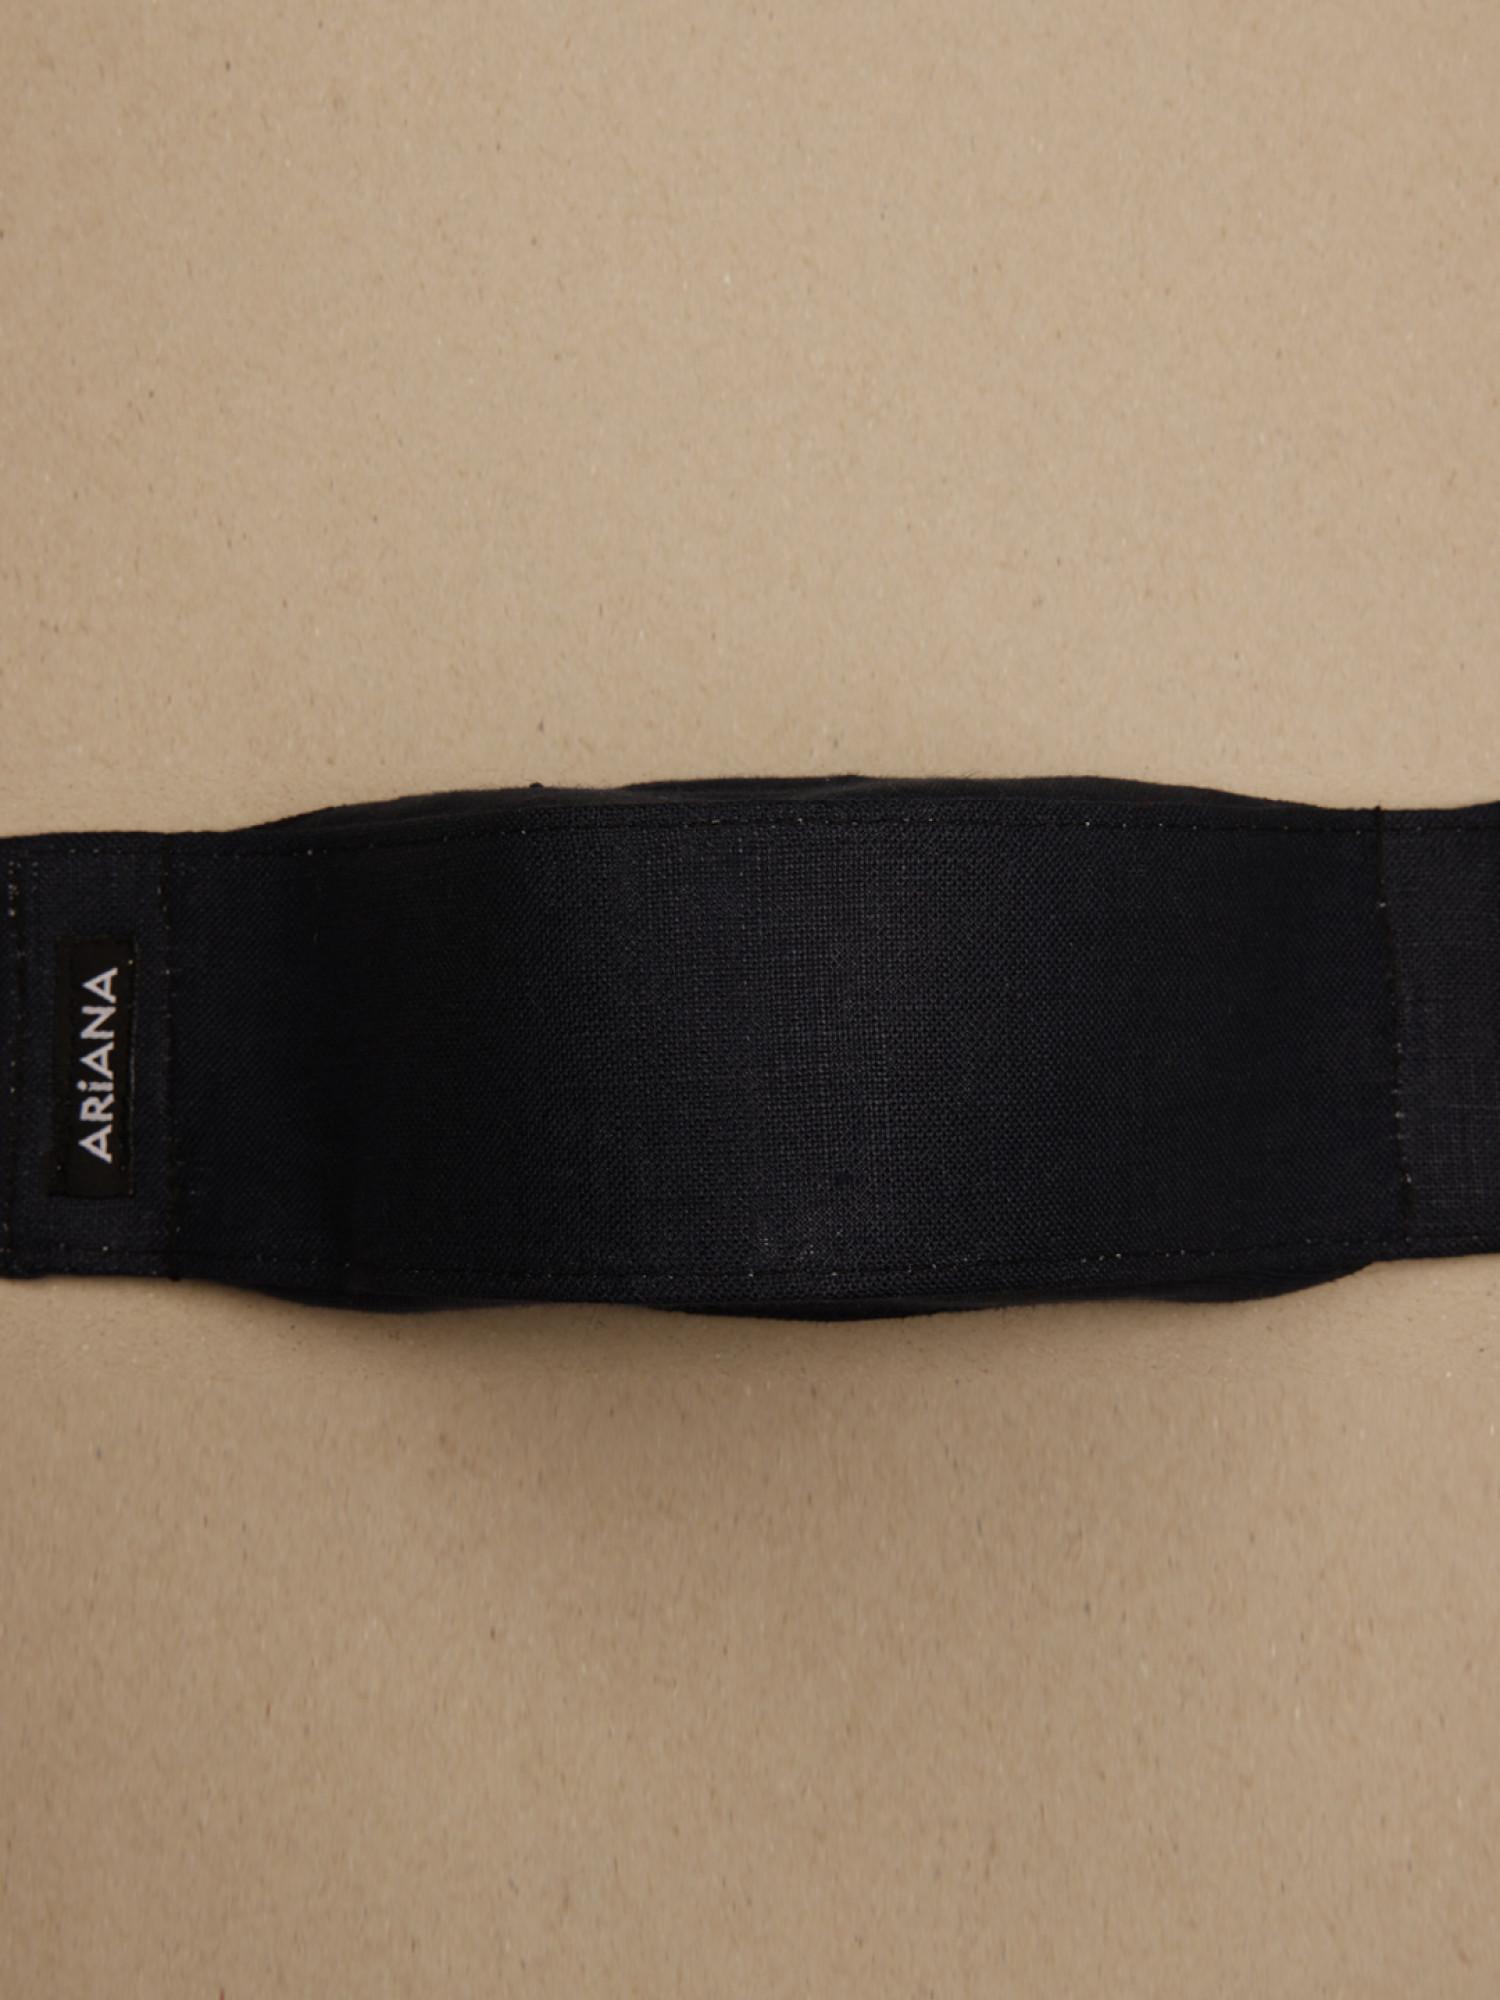 3D Unisex 7 Layer Linen Mask 99% Safe